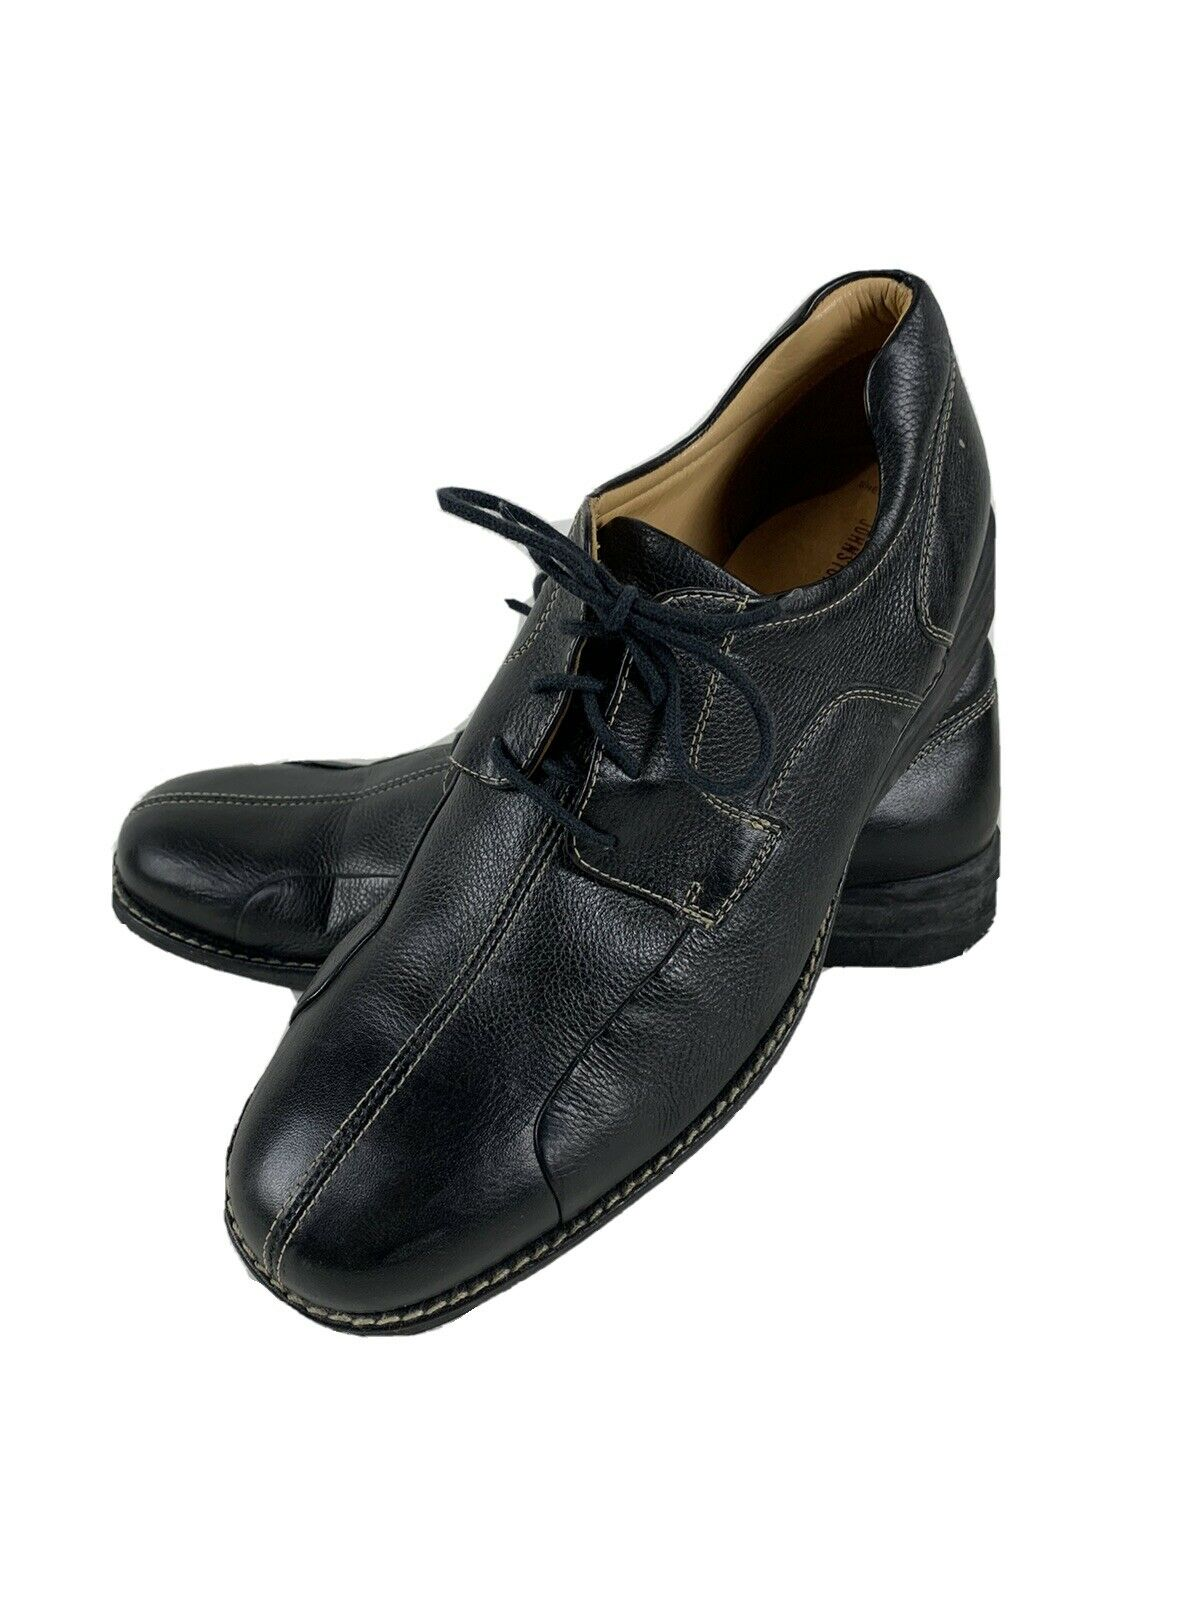 Johnston Murphy Sheepskin Split Toe Lace Up Oxford Shoes Mens 13 M Black